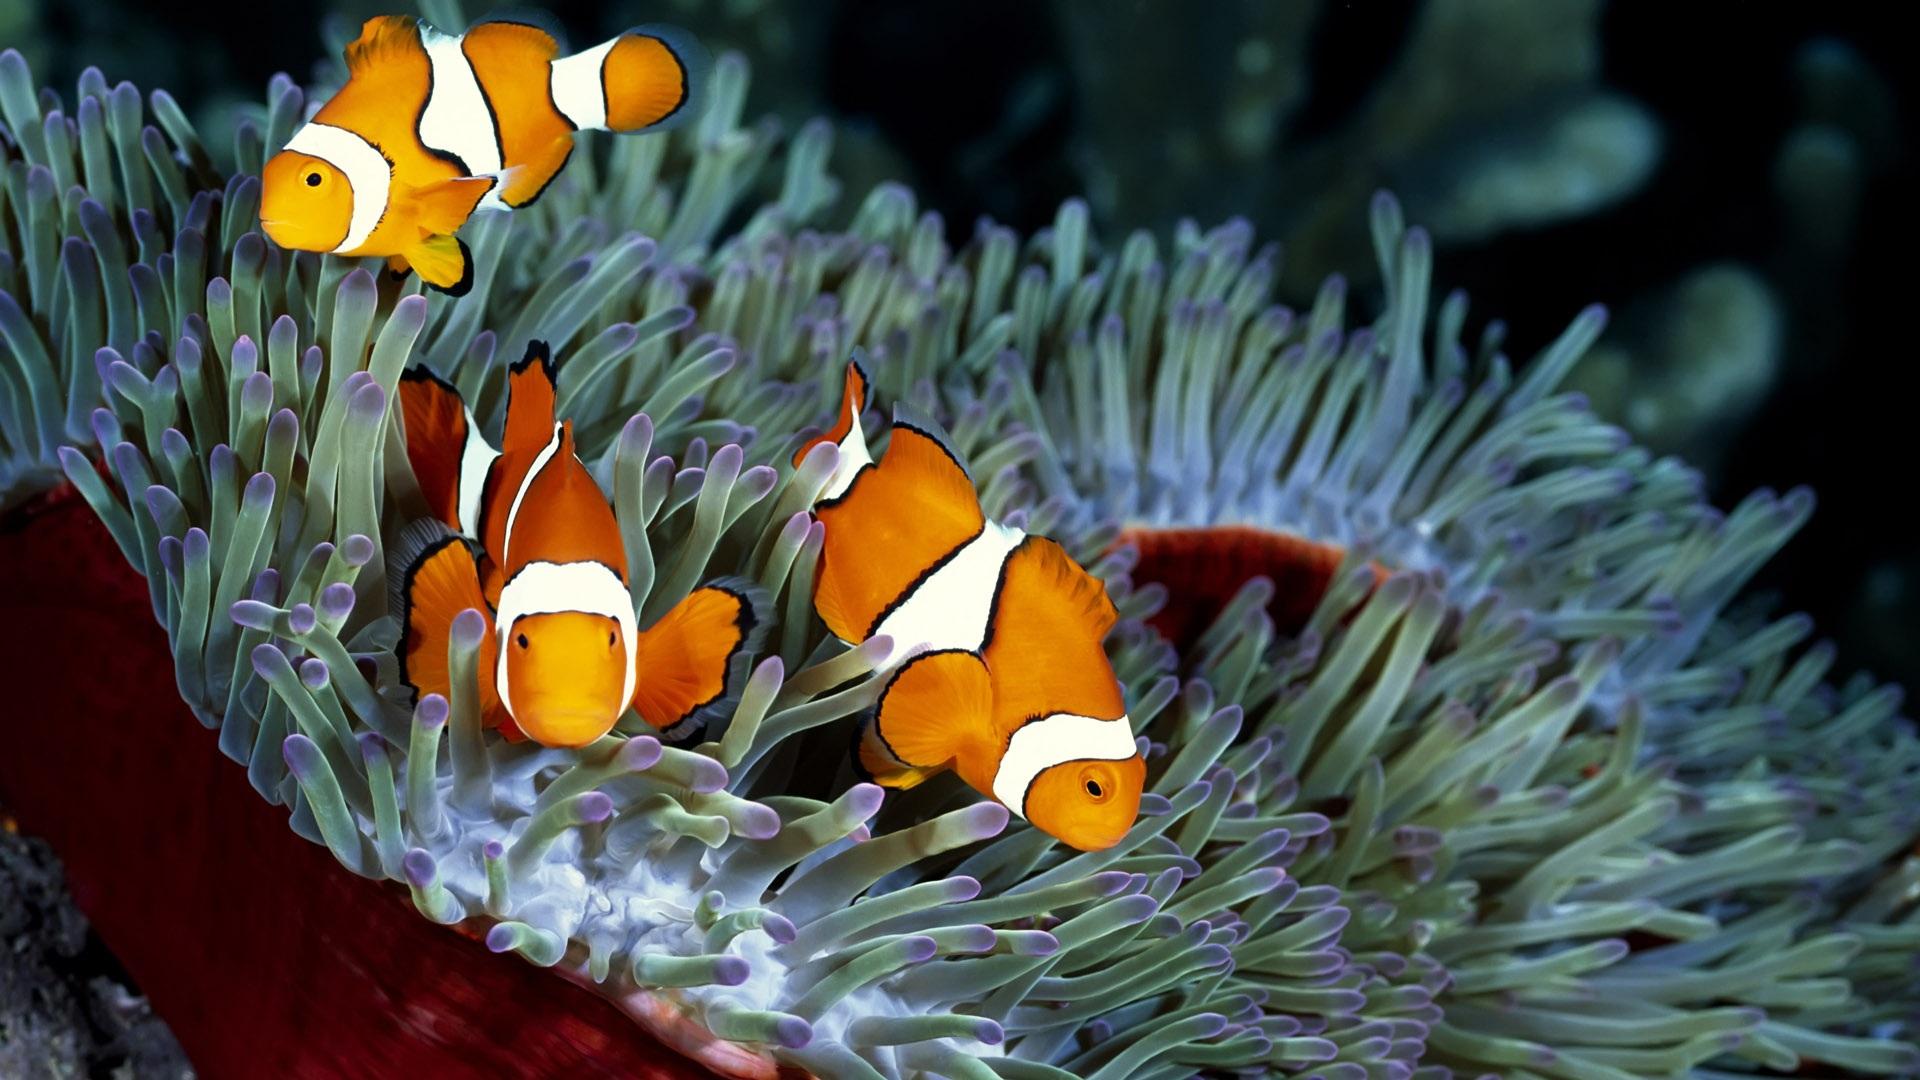 Three orange tropical fish and coral wallpaper 1920x1080 full hd